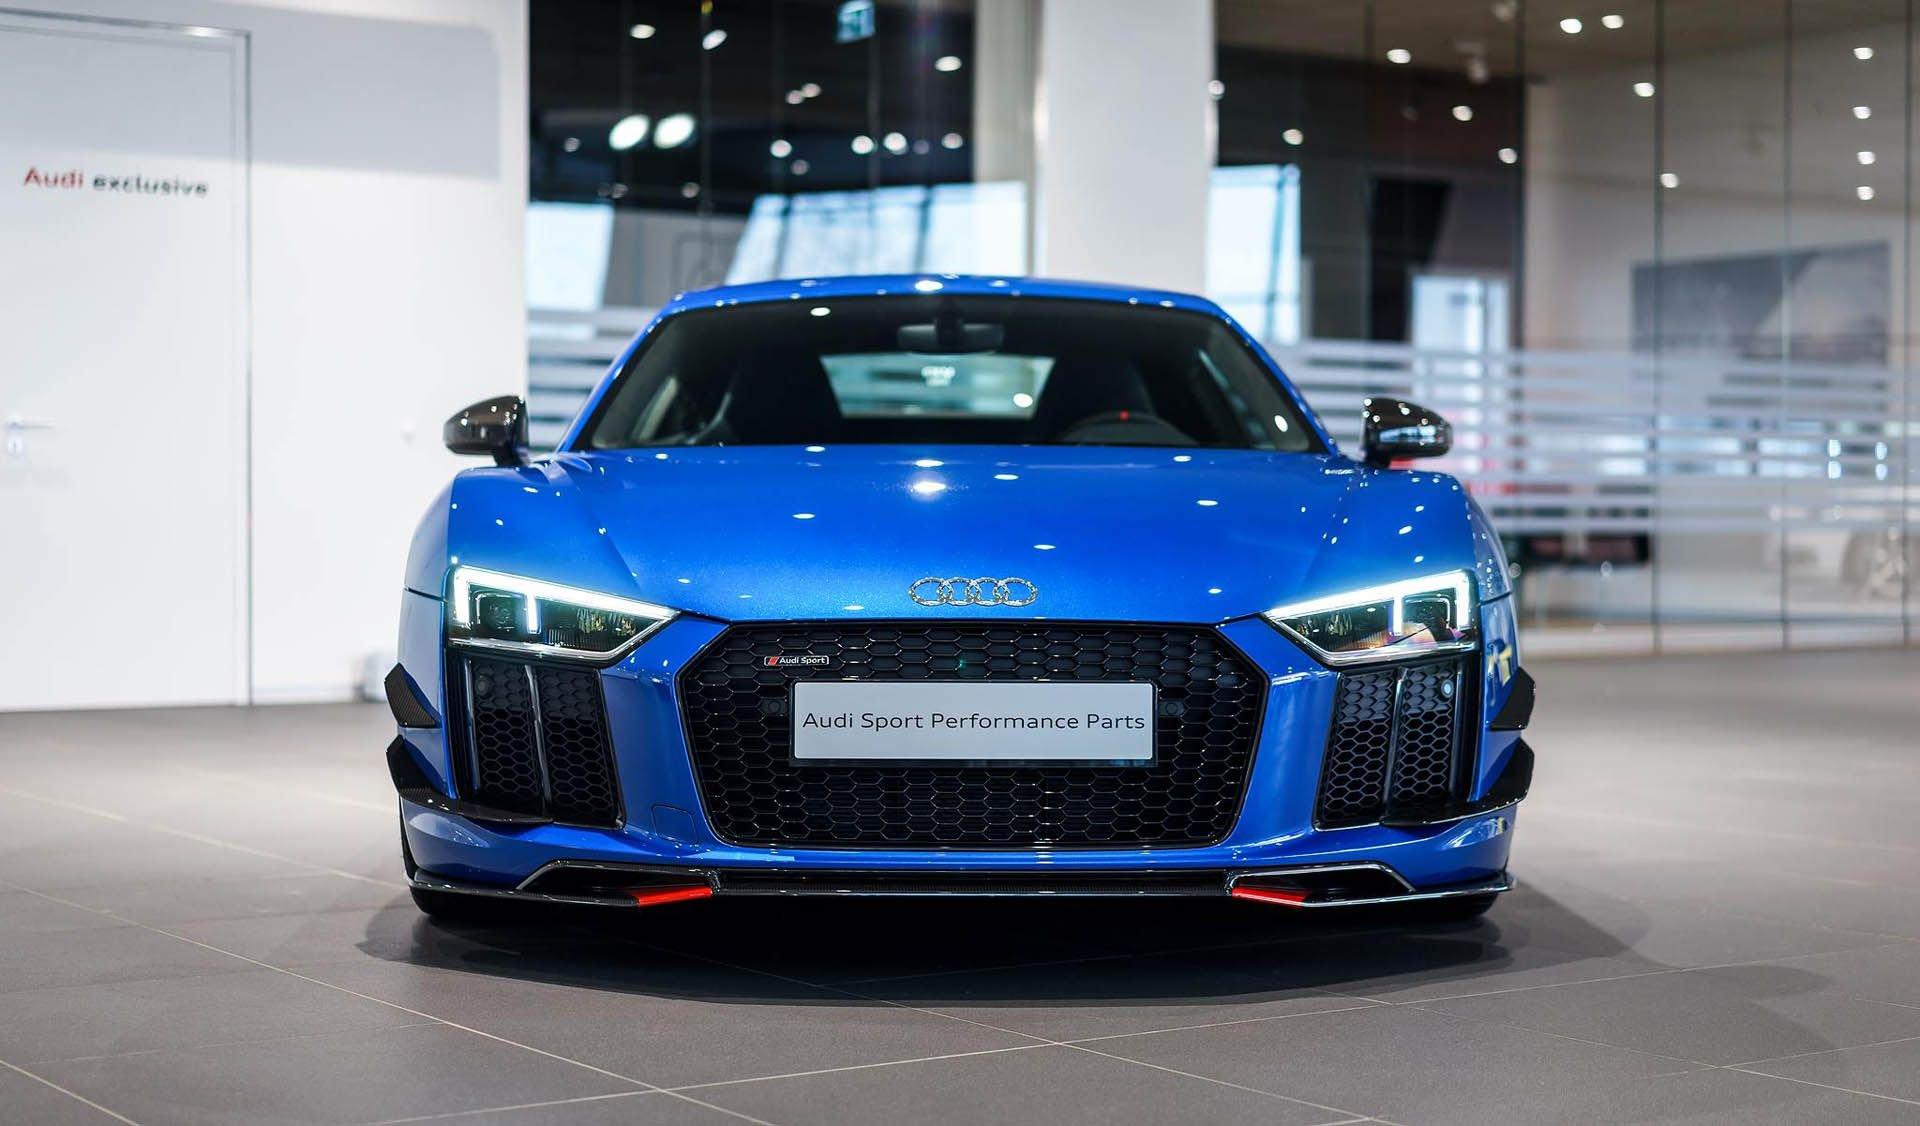 Audi_R8_V10_Plus_Performance_Parts_0004